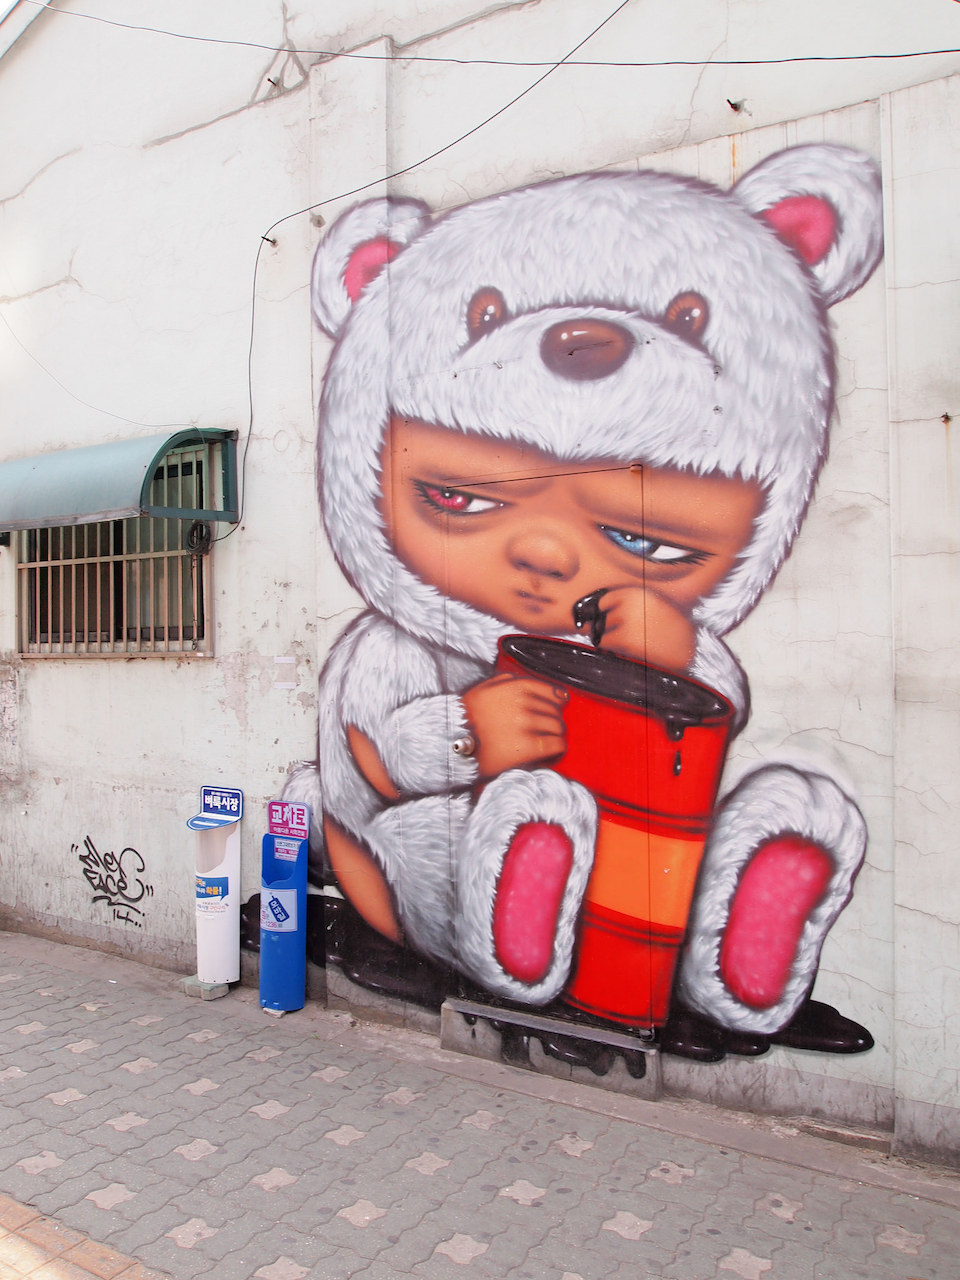 Street Art fromSeoul Area, South Korea. Photo byMark Johnson1